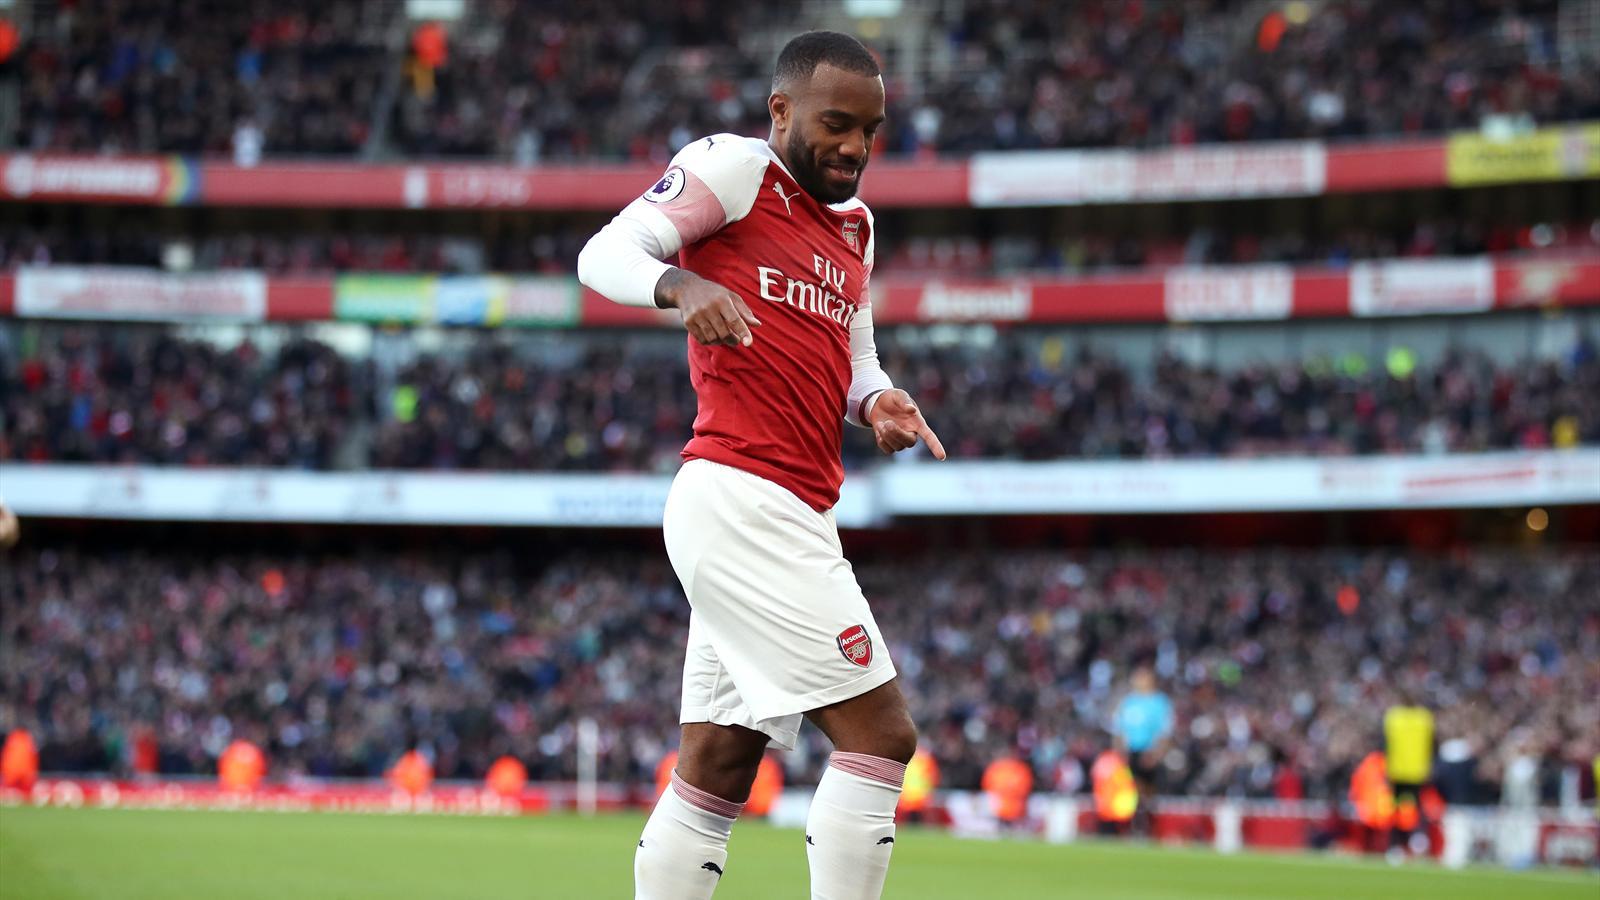 Football news - Alexandre Lacazette rocket helps Arsenal sink Everton - Premier League 2018-2019 ...